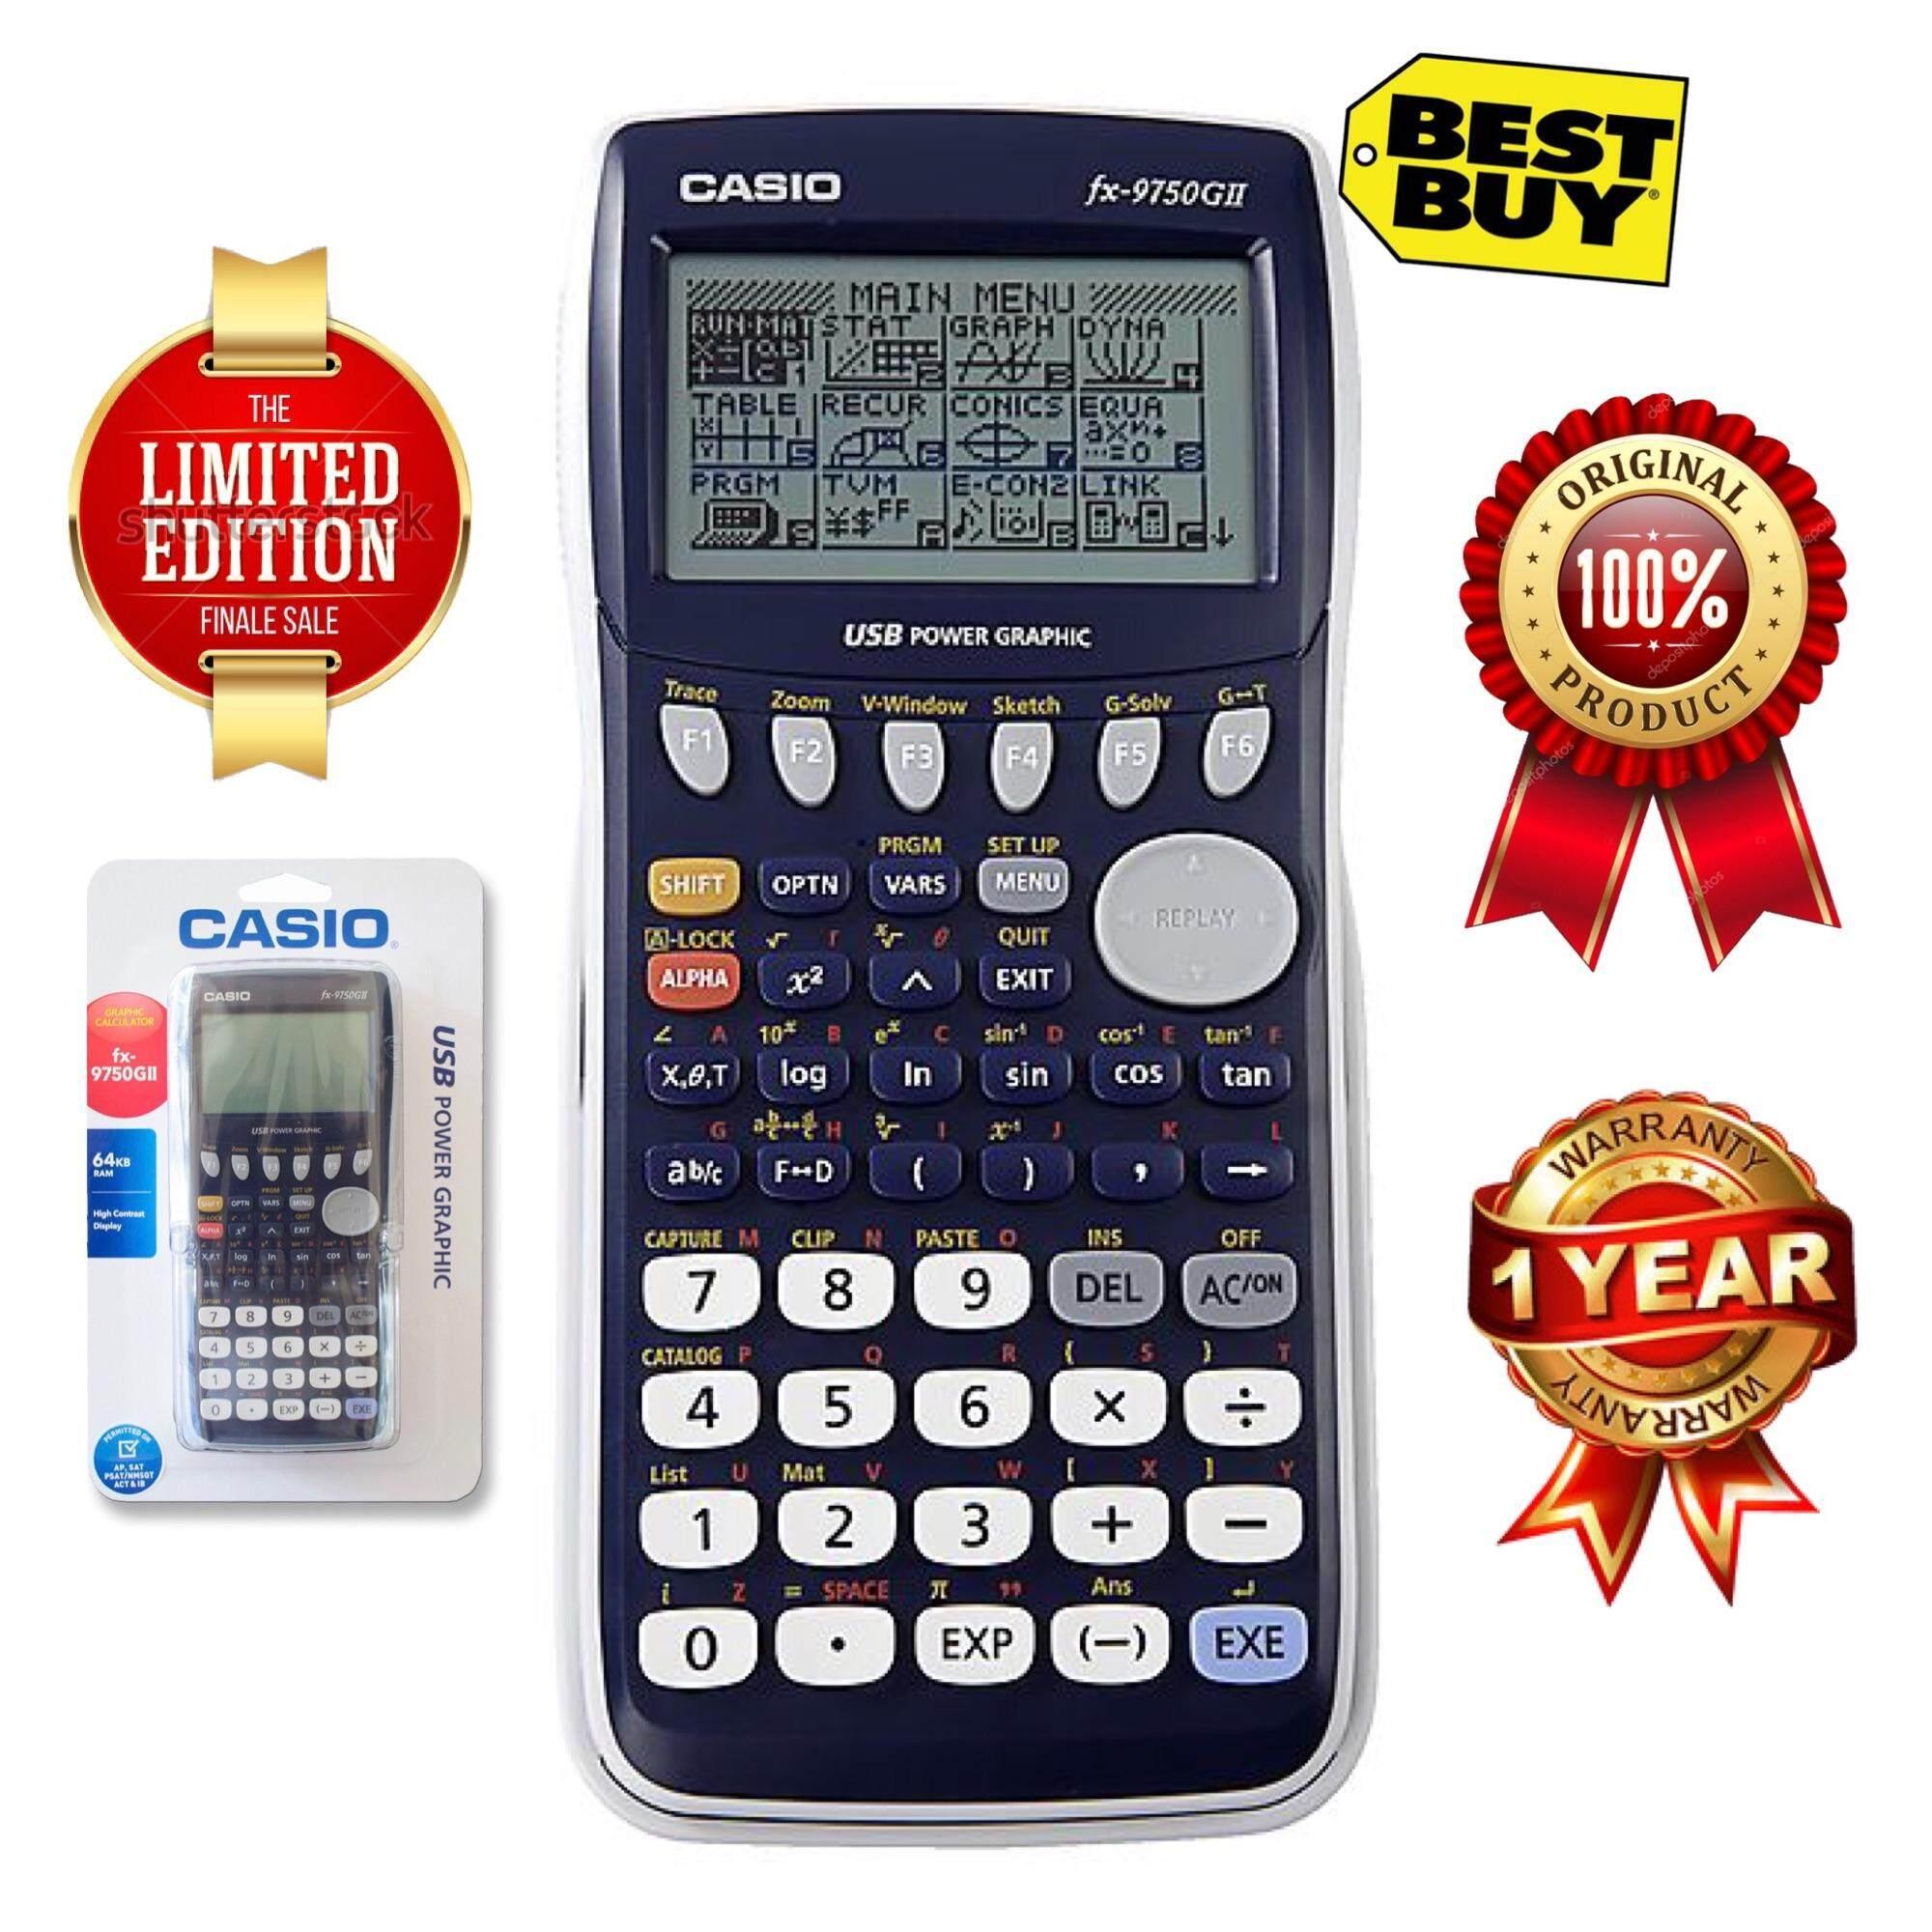 Casio Calculators For The Best Prices In Malaysia Scientific Calculator Fx 570es Plus Graphics 9750gii